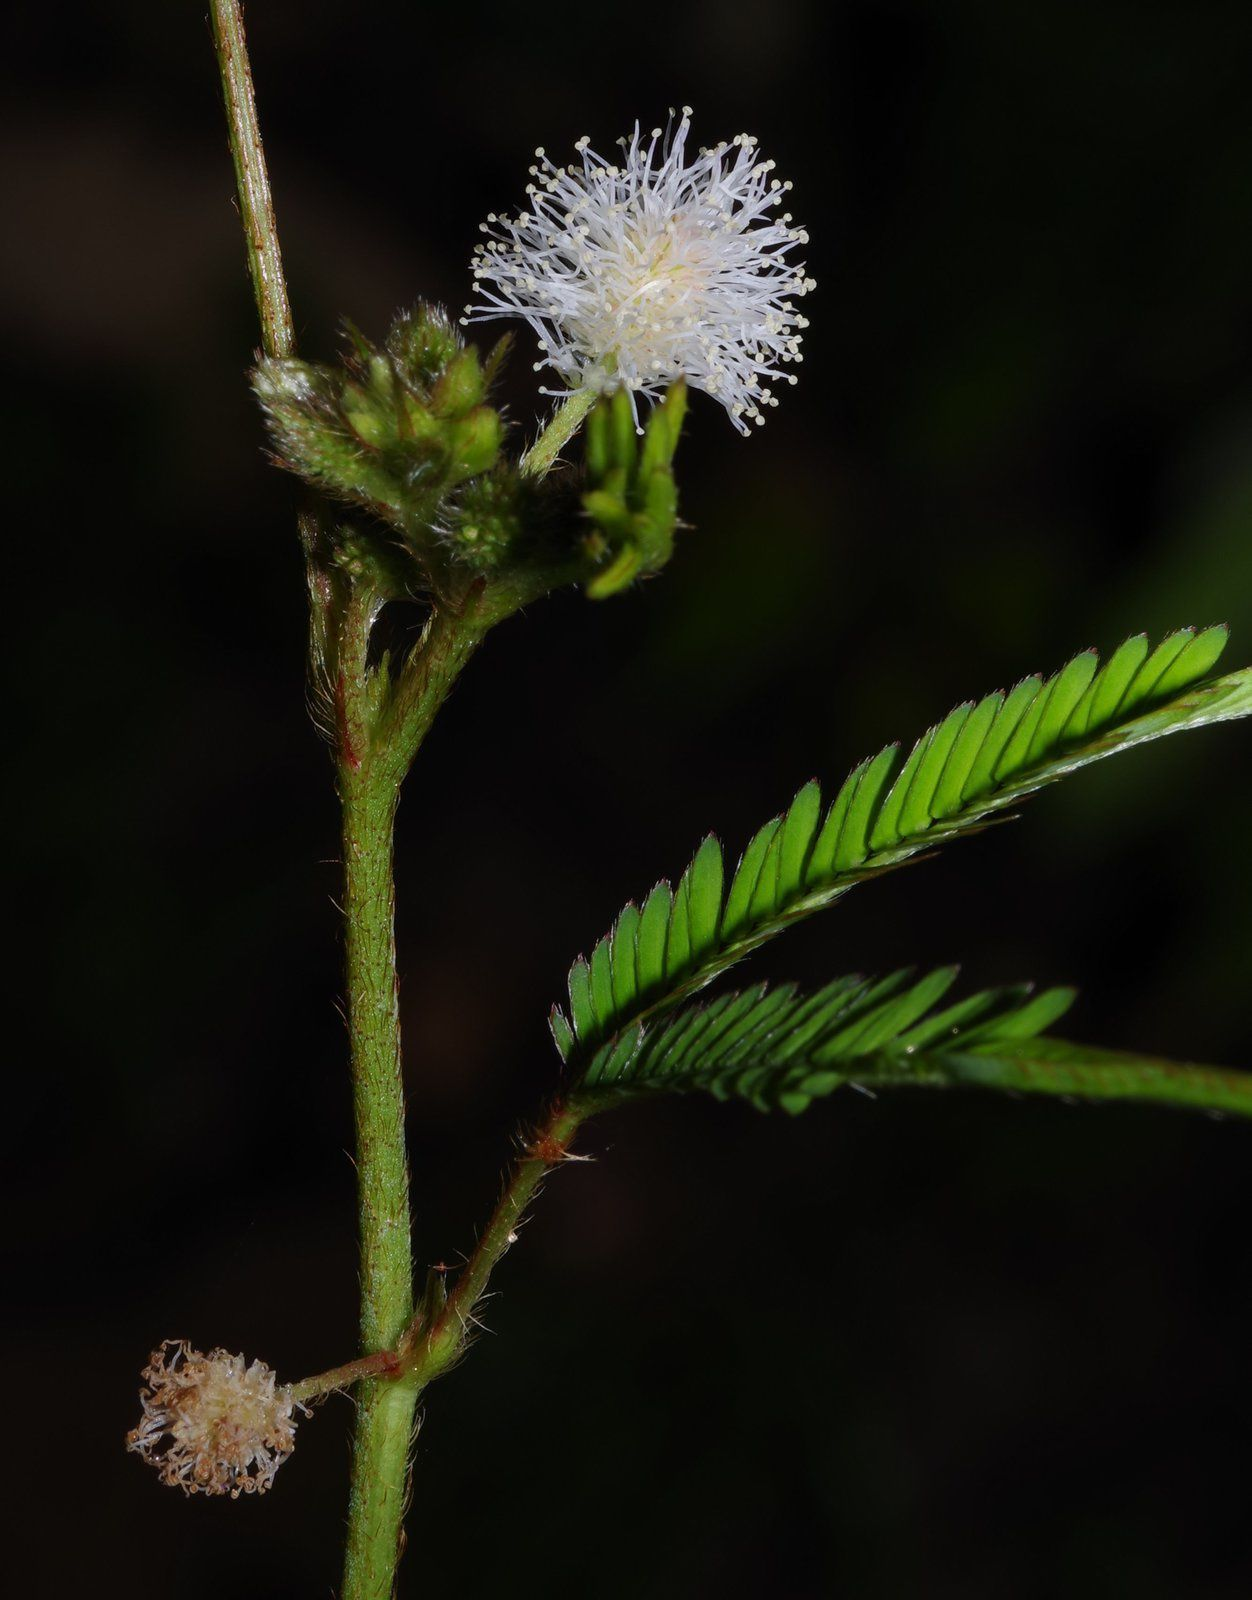 Mimosa polydactyla